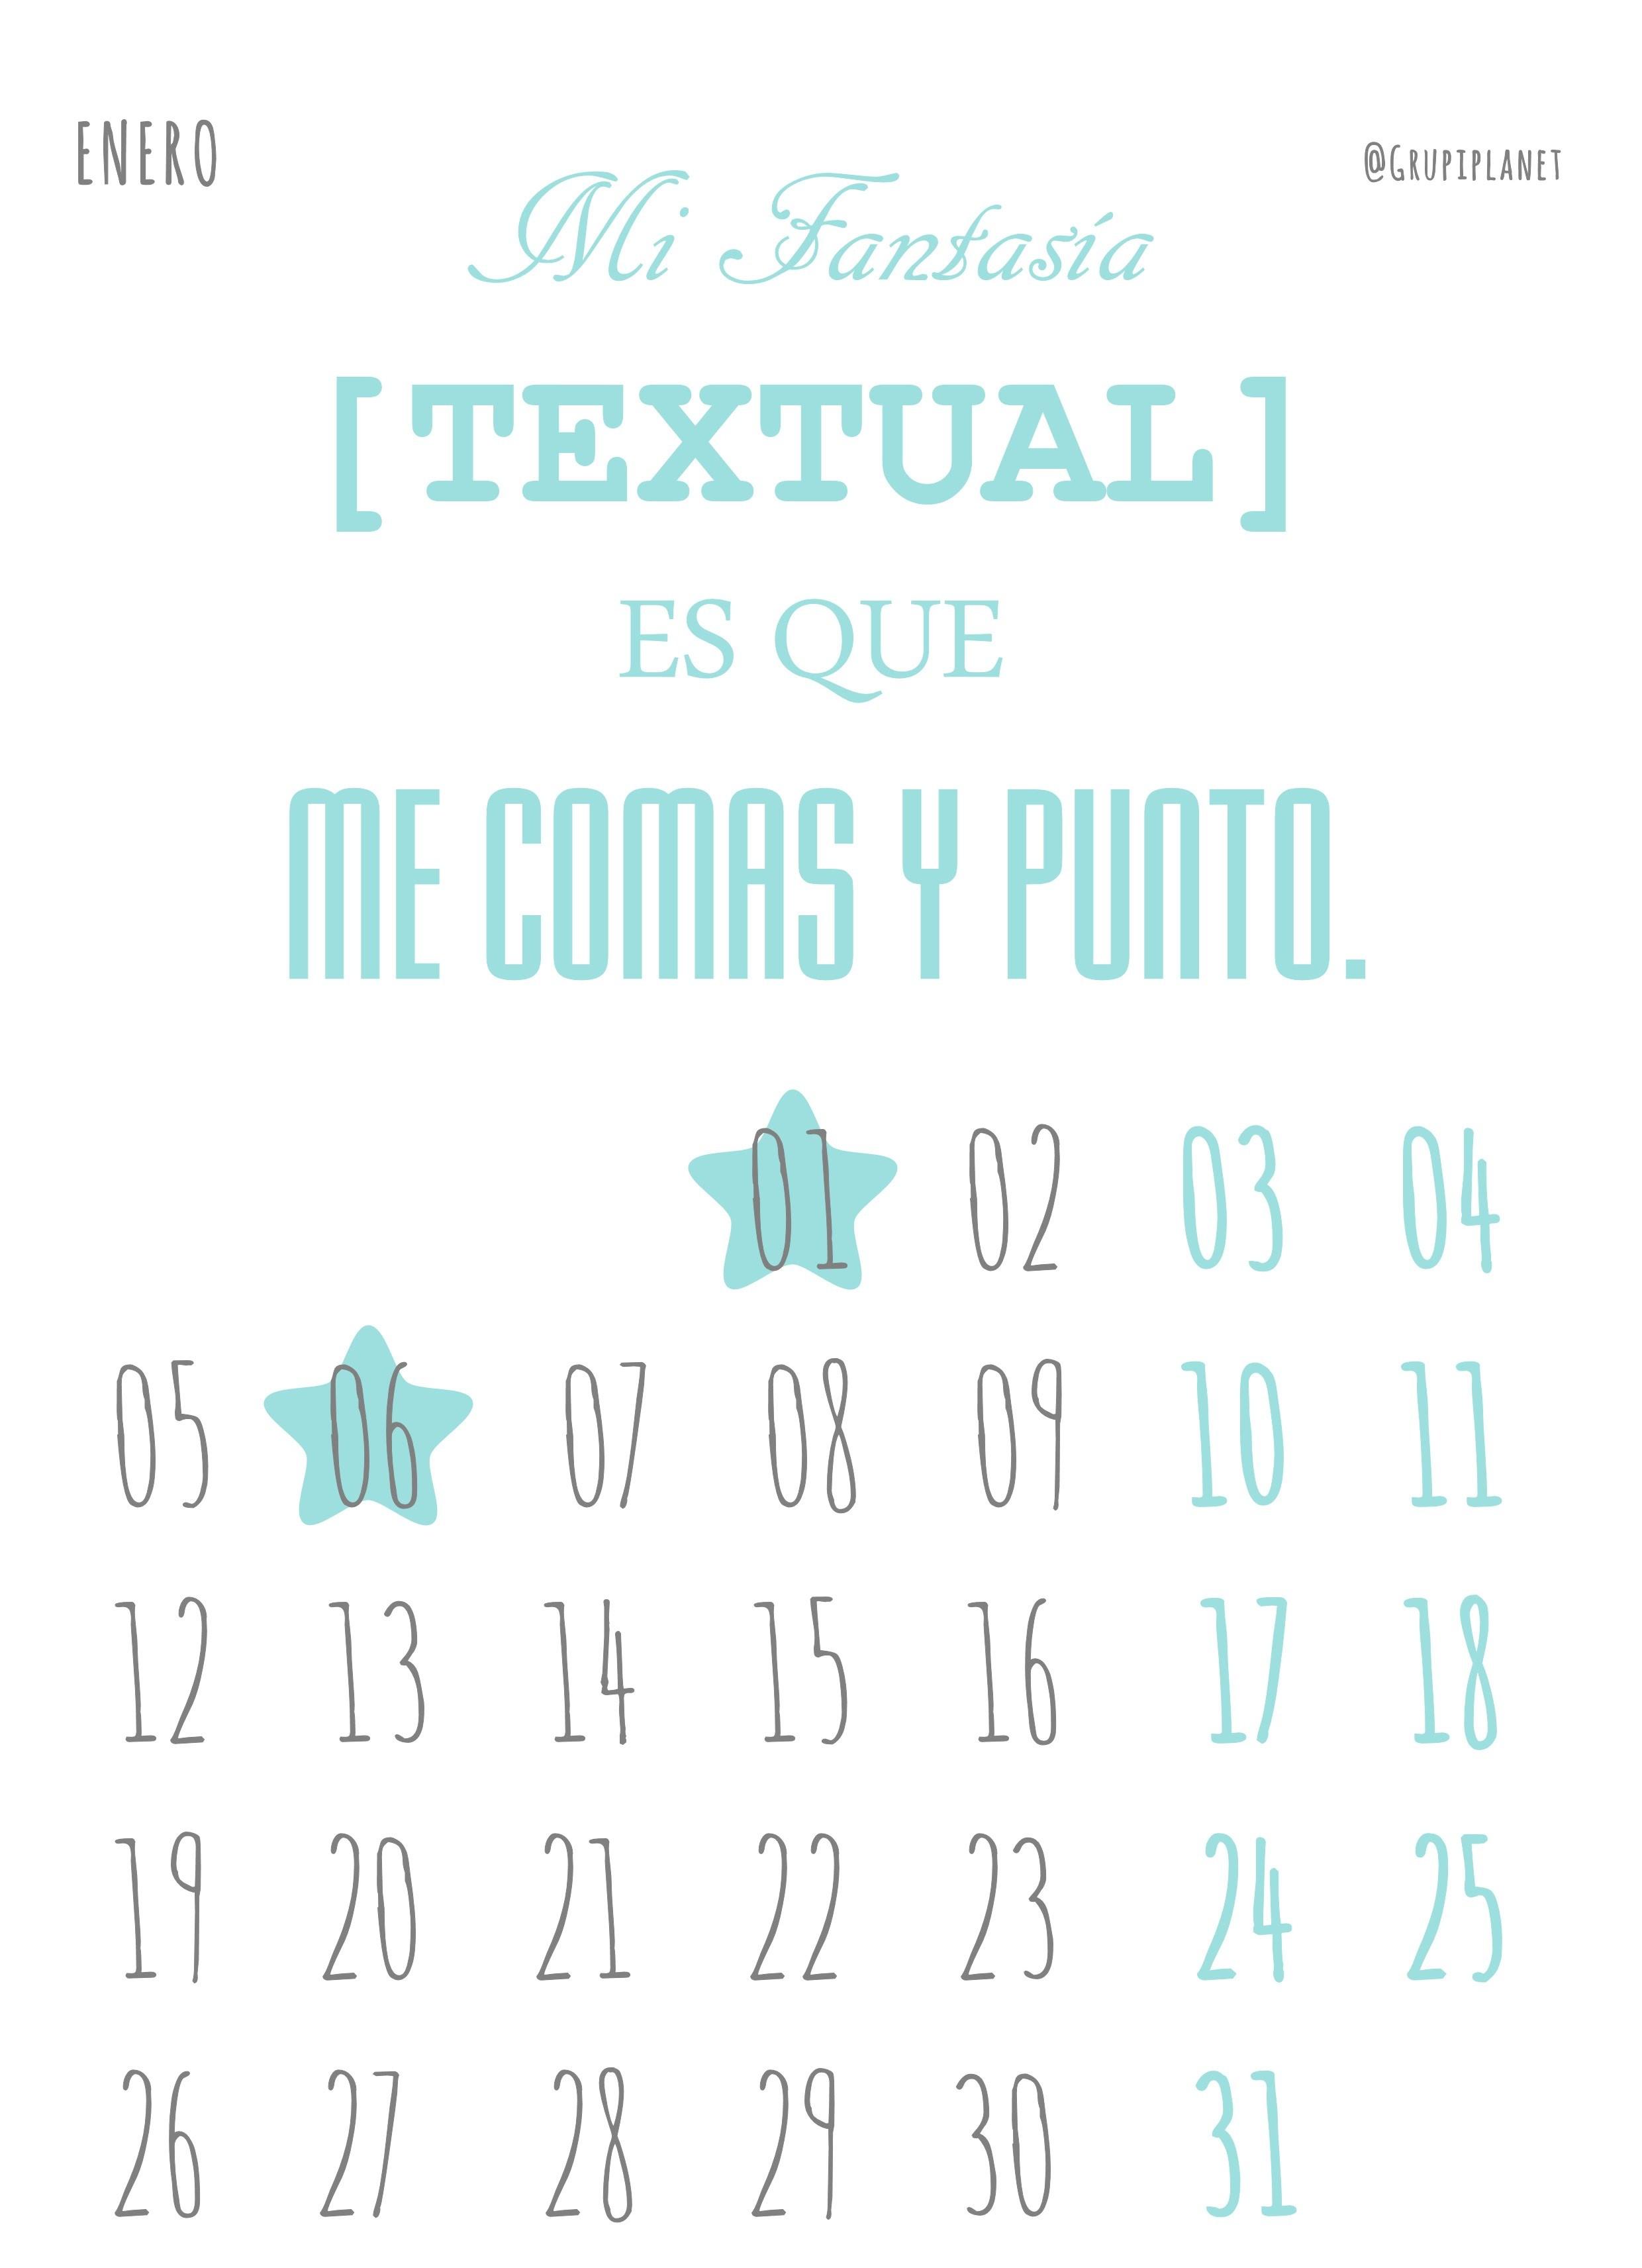 calendario septiembre 2015 calendarios mensuales 2015 para